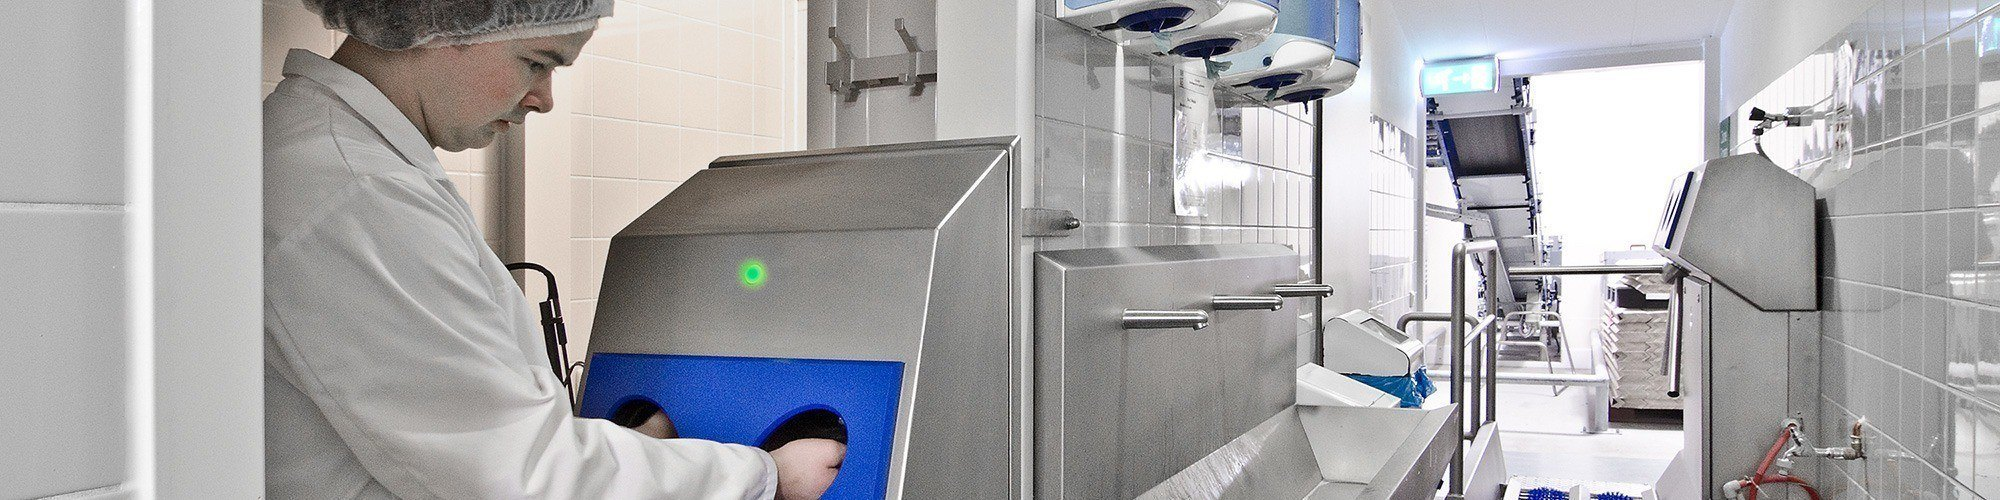 Banner_Chemiedispensers-1-2000x500 (1)